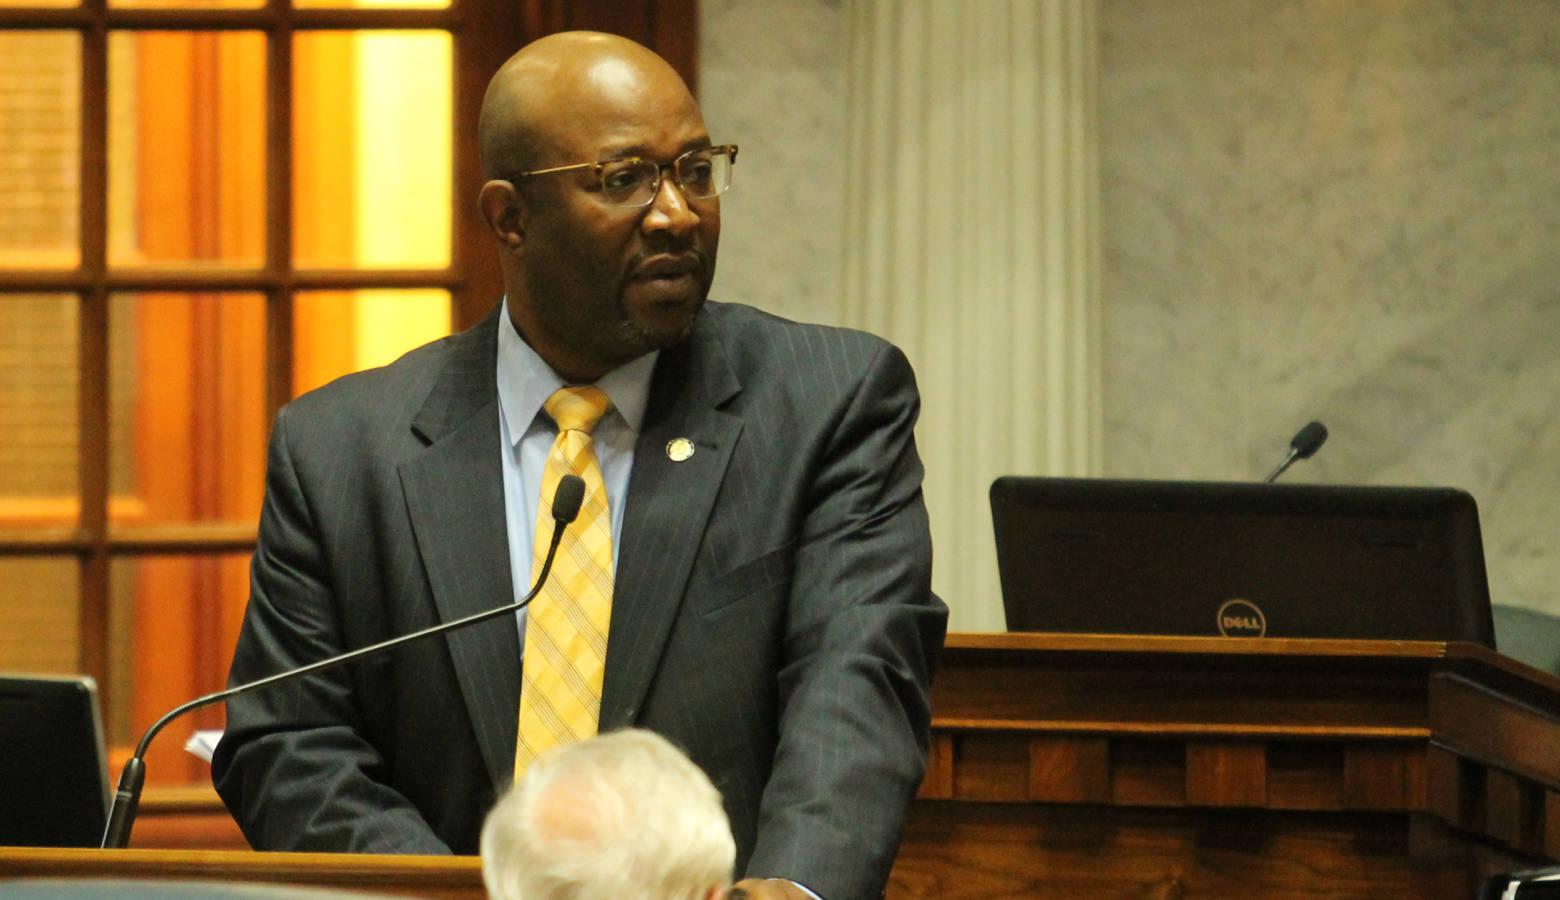 Sen. Greg Taylor (D-Indianapolis) argues SB 33 would not necessarily keep churches safe. (Lauren Chapman/IPB News)